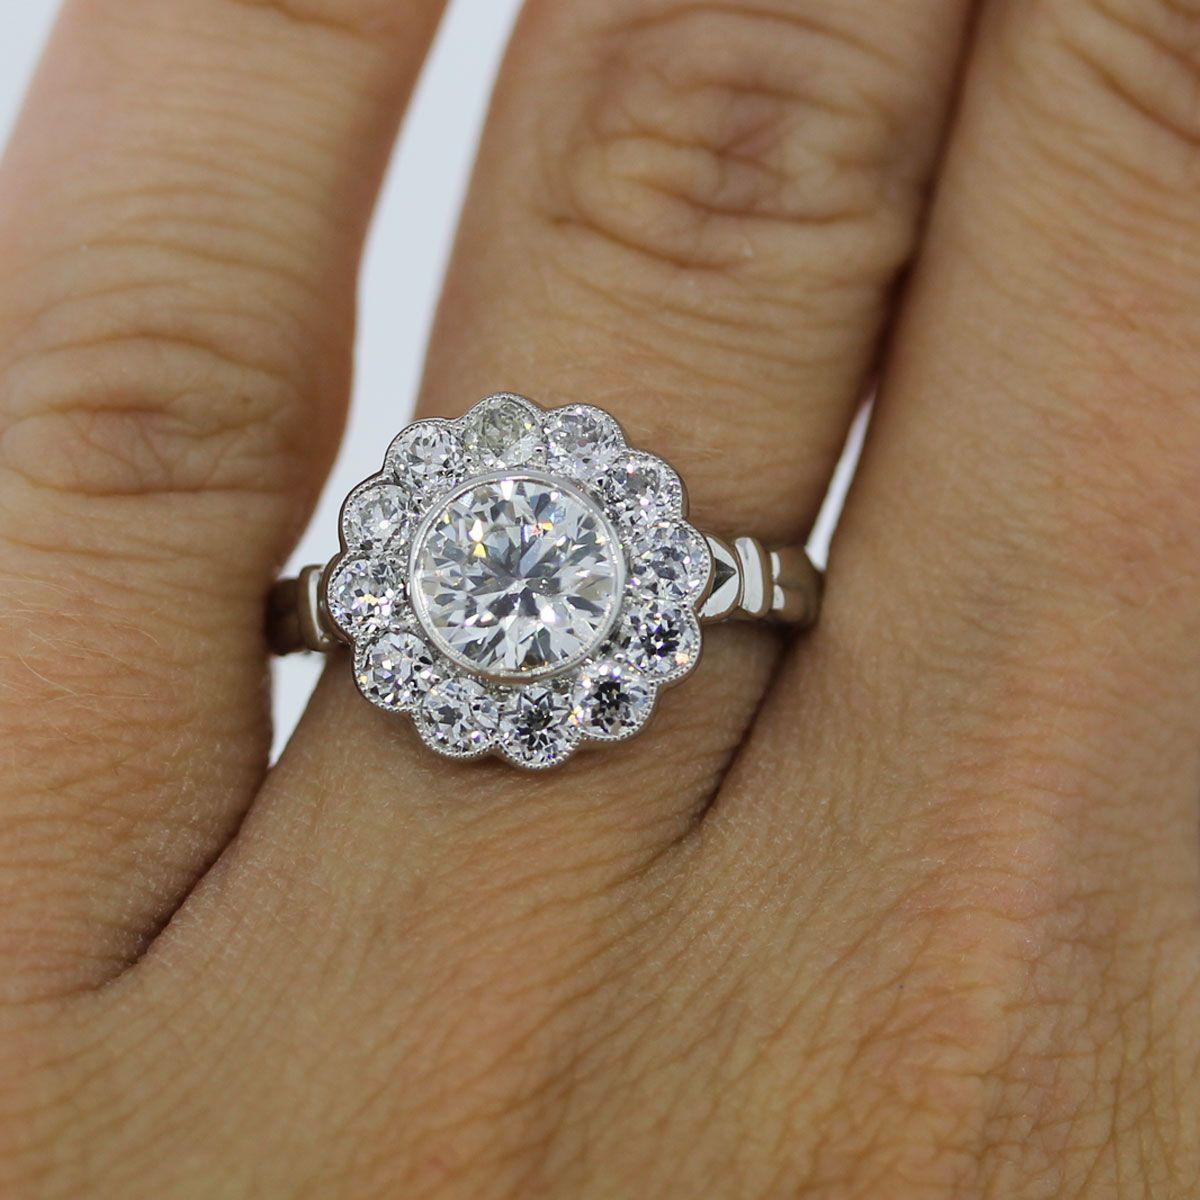 Platinum 115ct Old European Cut Diamond Flower Engagement Ring: Diamond Flower Wedding Rings At Reisefeber.org